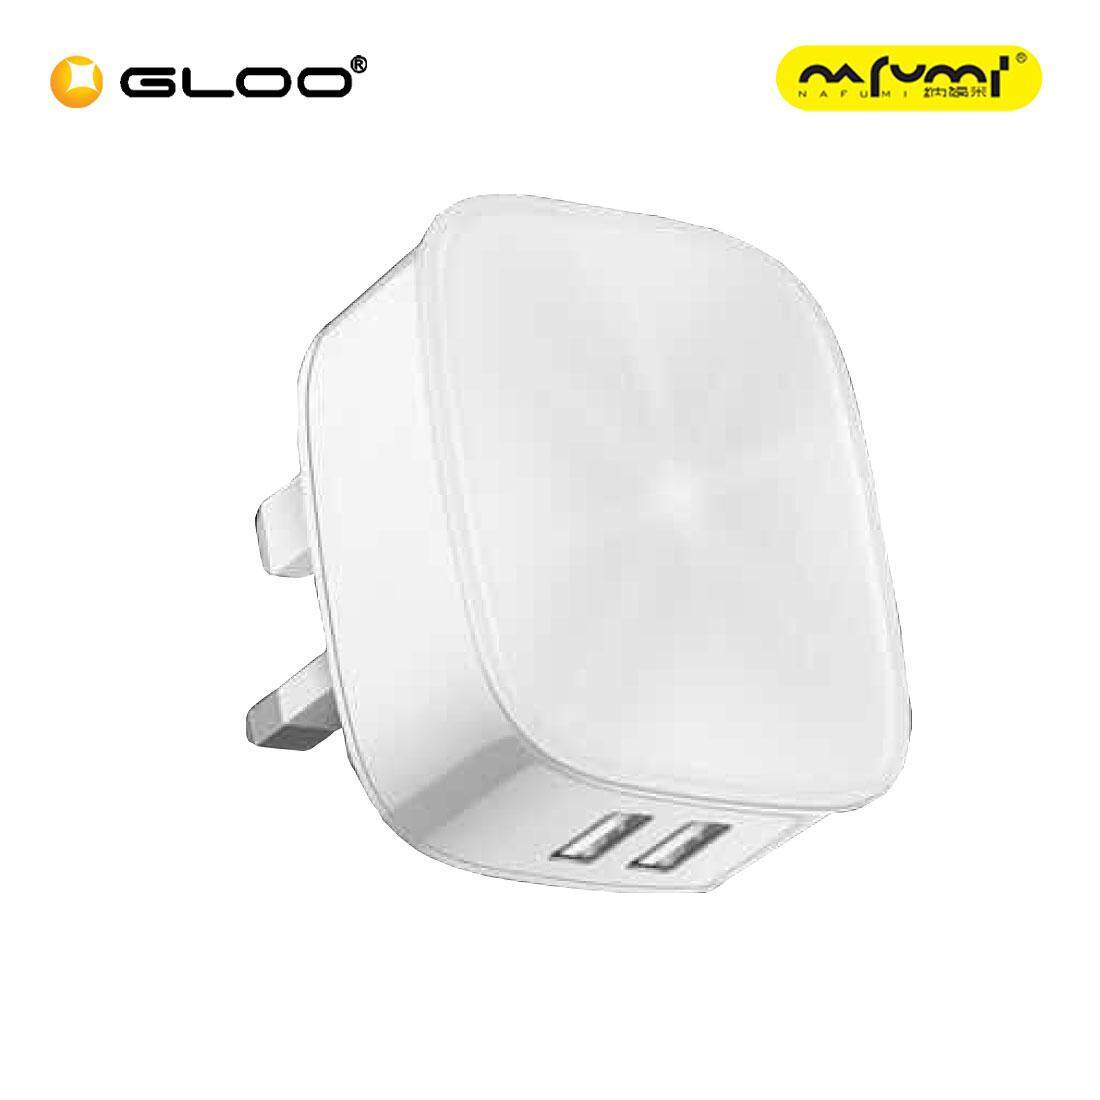 Nafumi Q20 Single USB Adapter (Black/White)